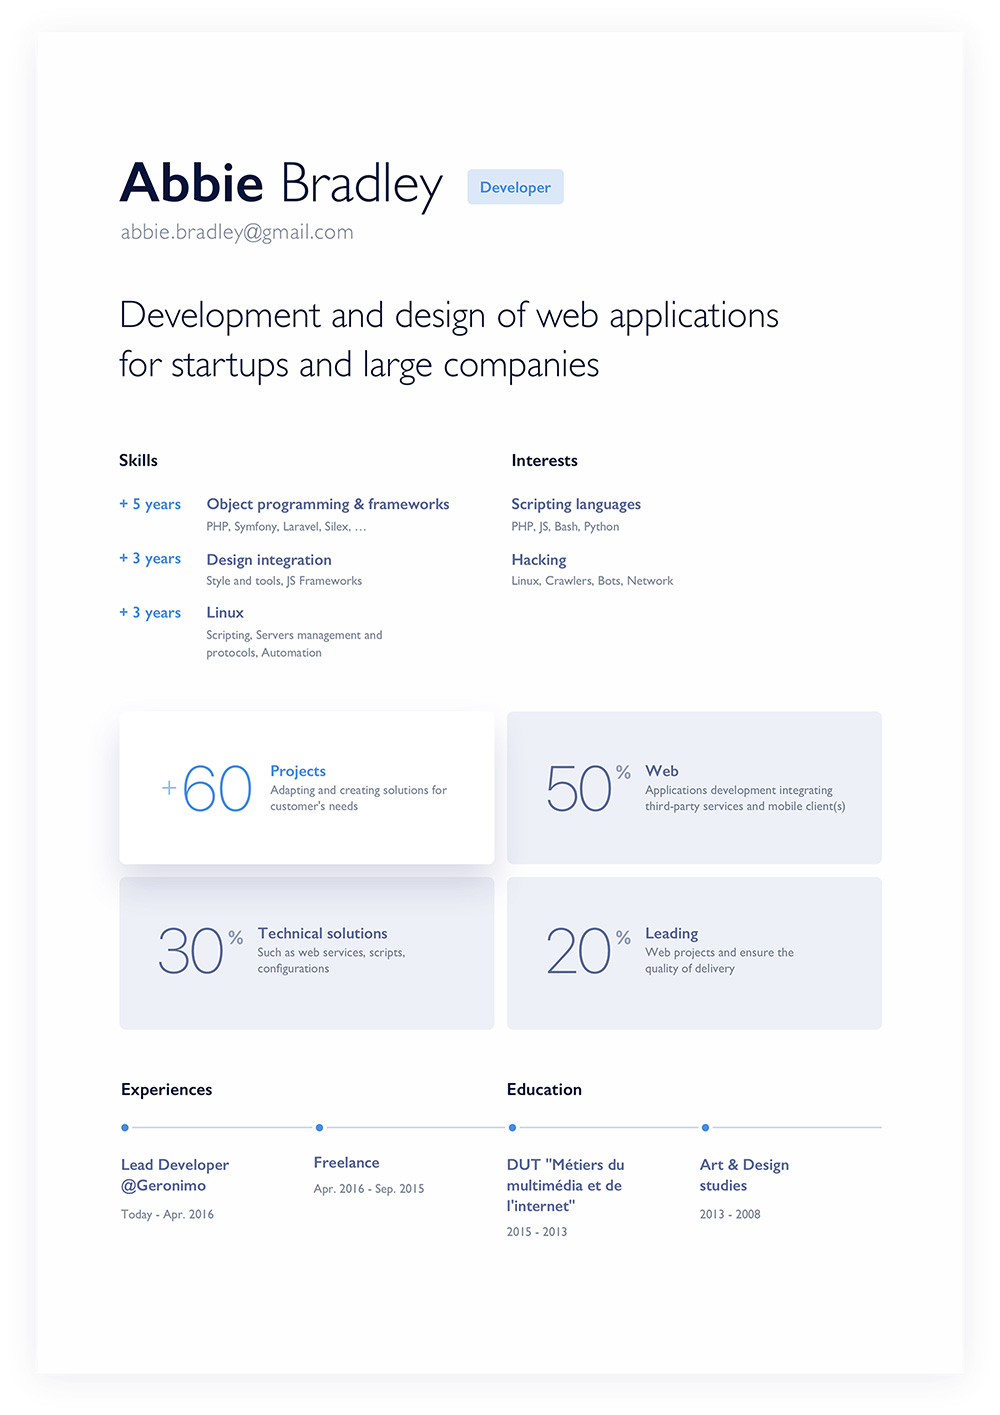 Free-Sketch-&-PSD-Resume-Template-for-Web-&-Software-Developer-2